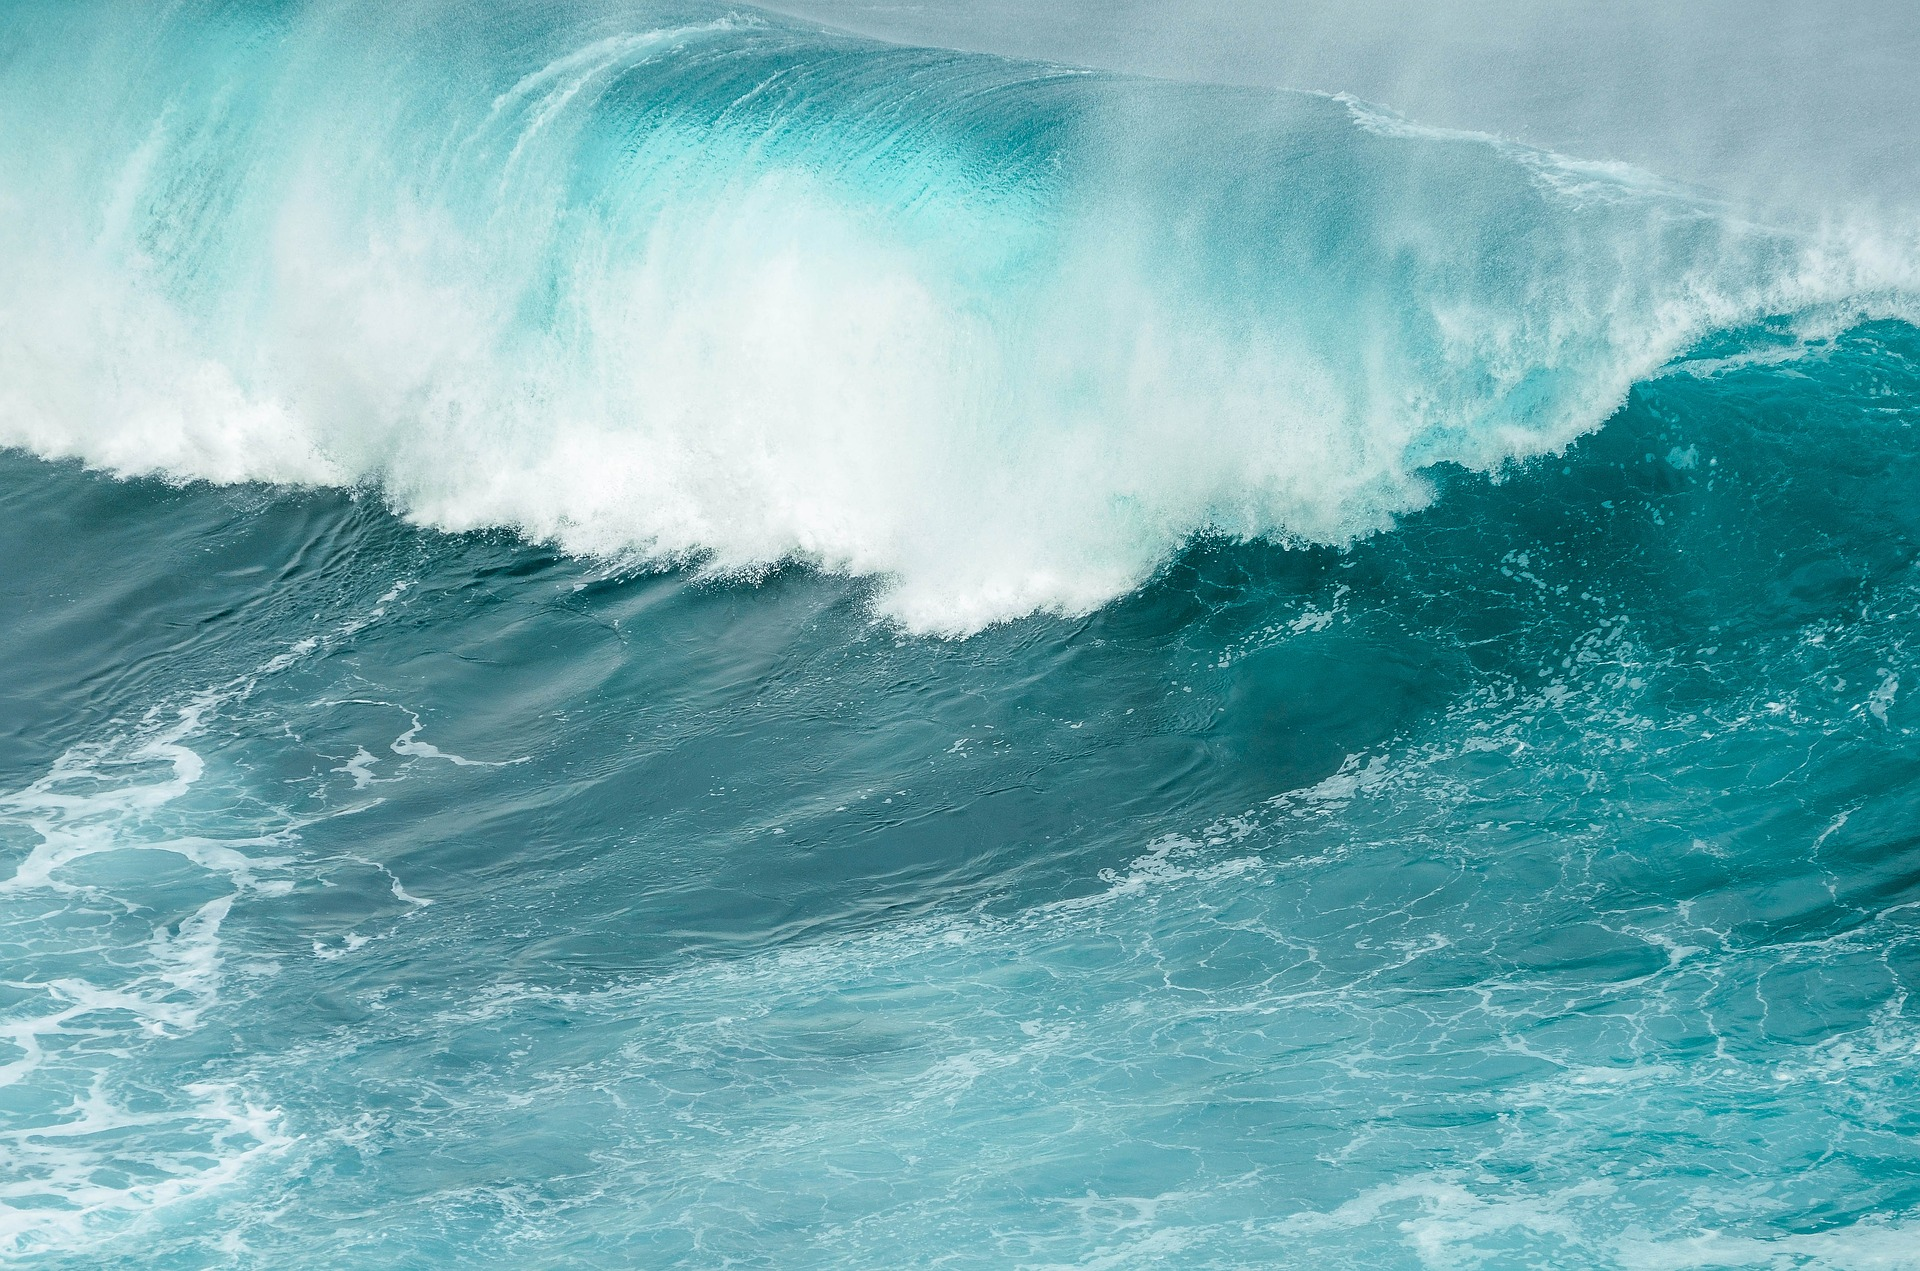 wave-4100647_1920